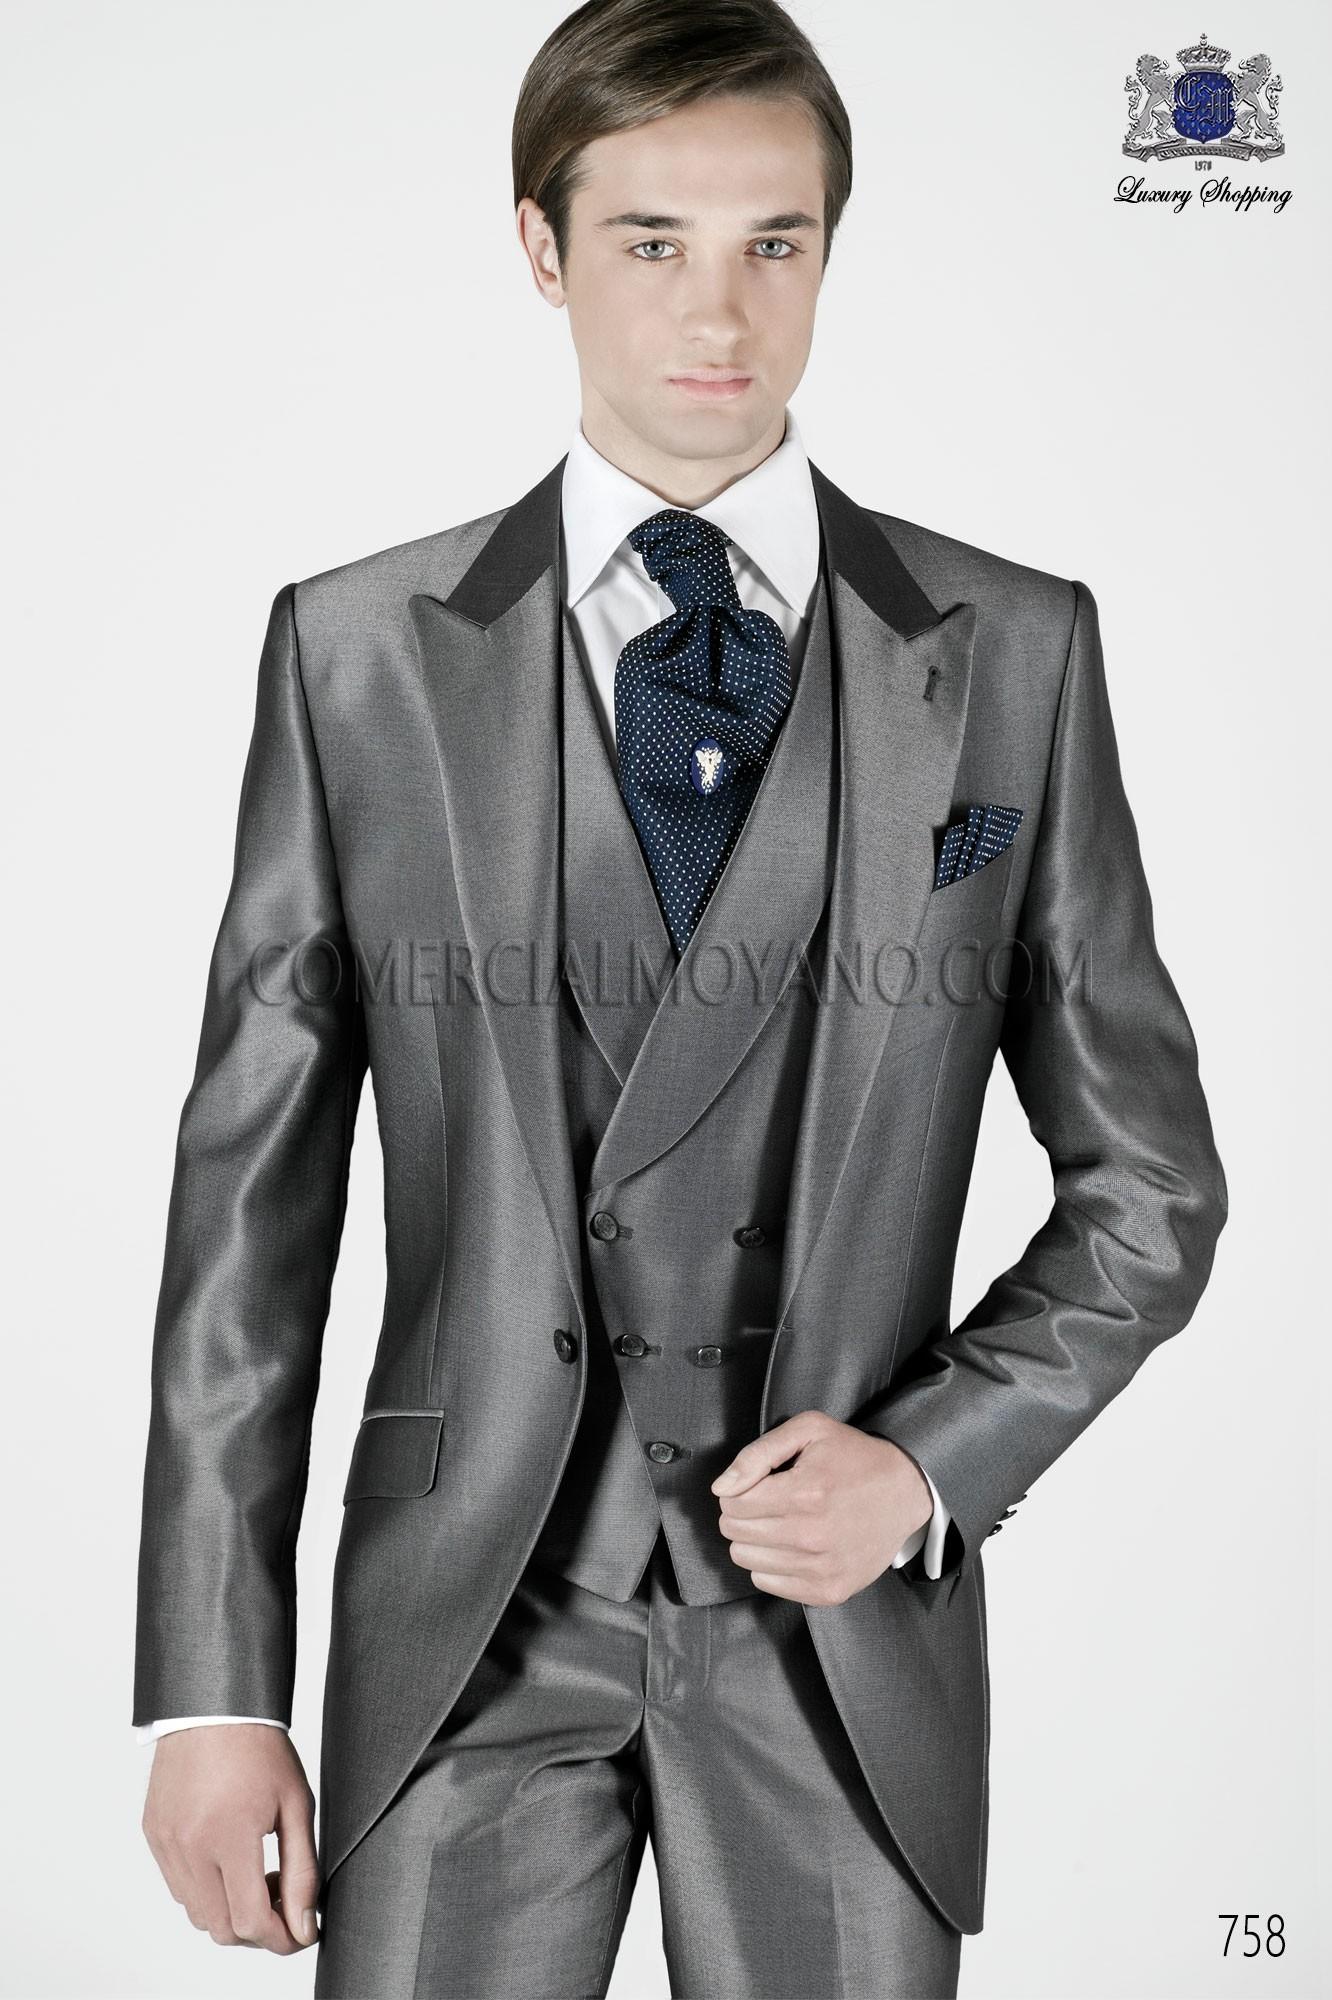 Italian short frock anthracite gray wedding suit, Ottavio Nuccio Gala.